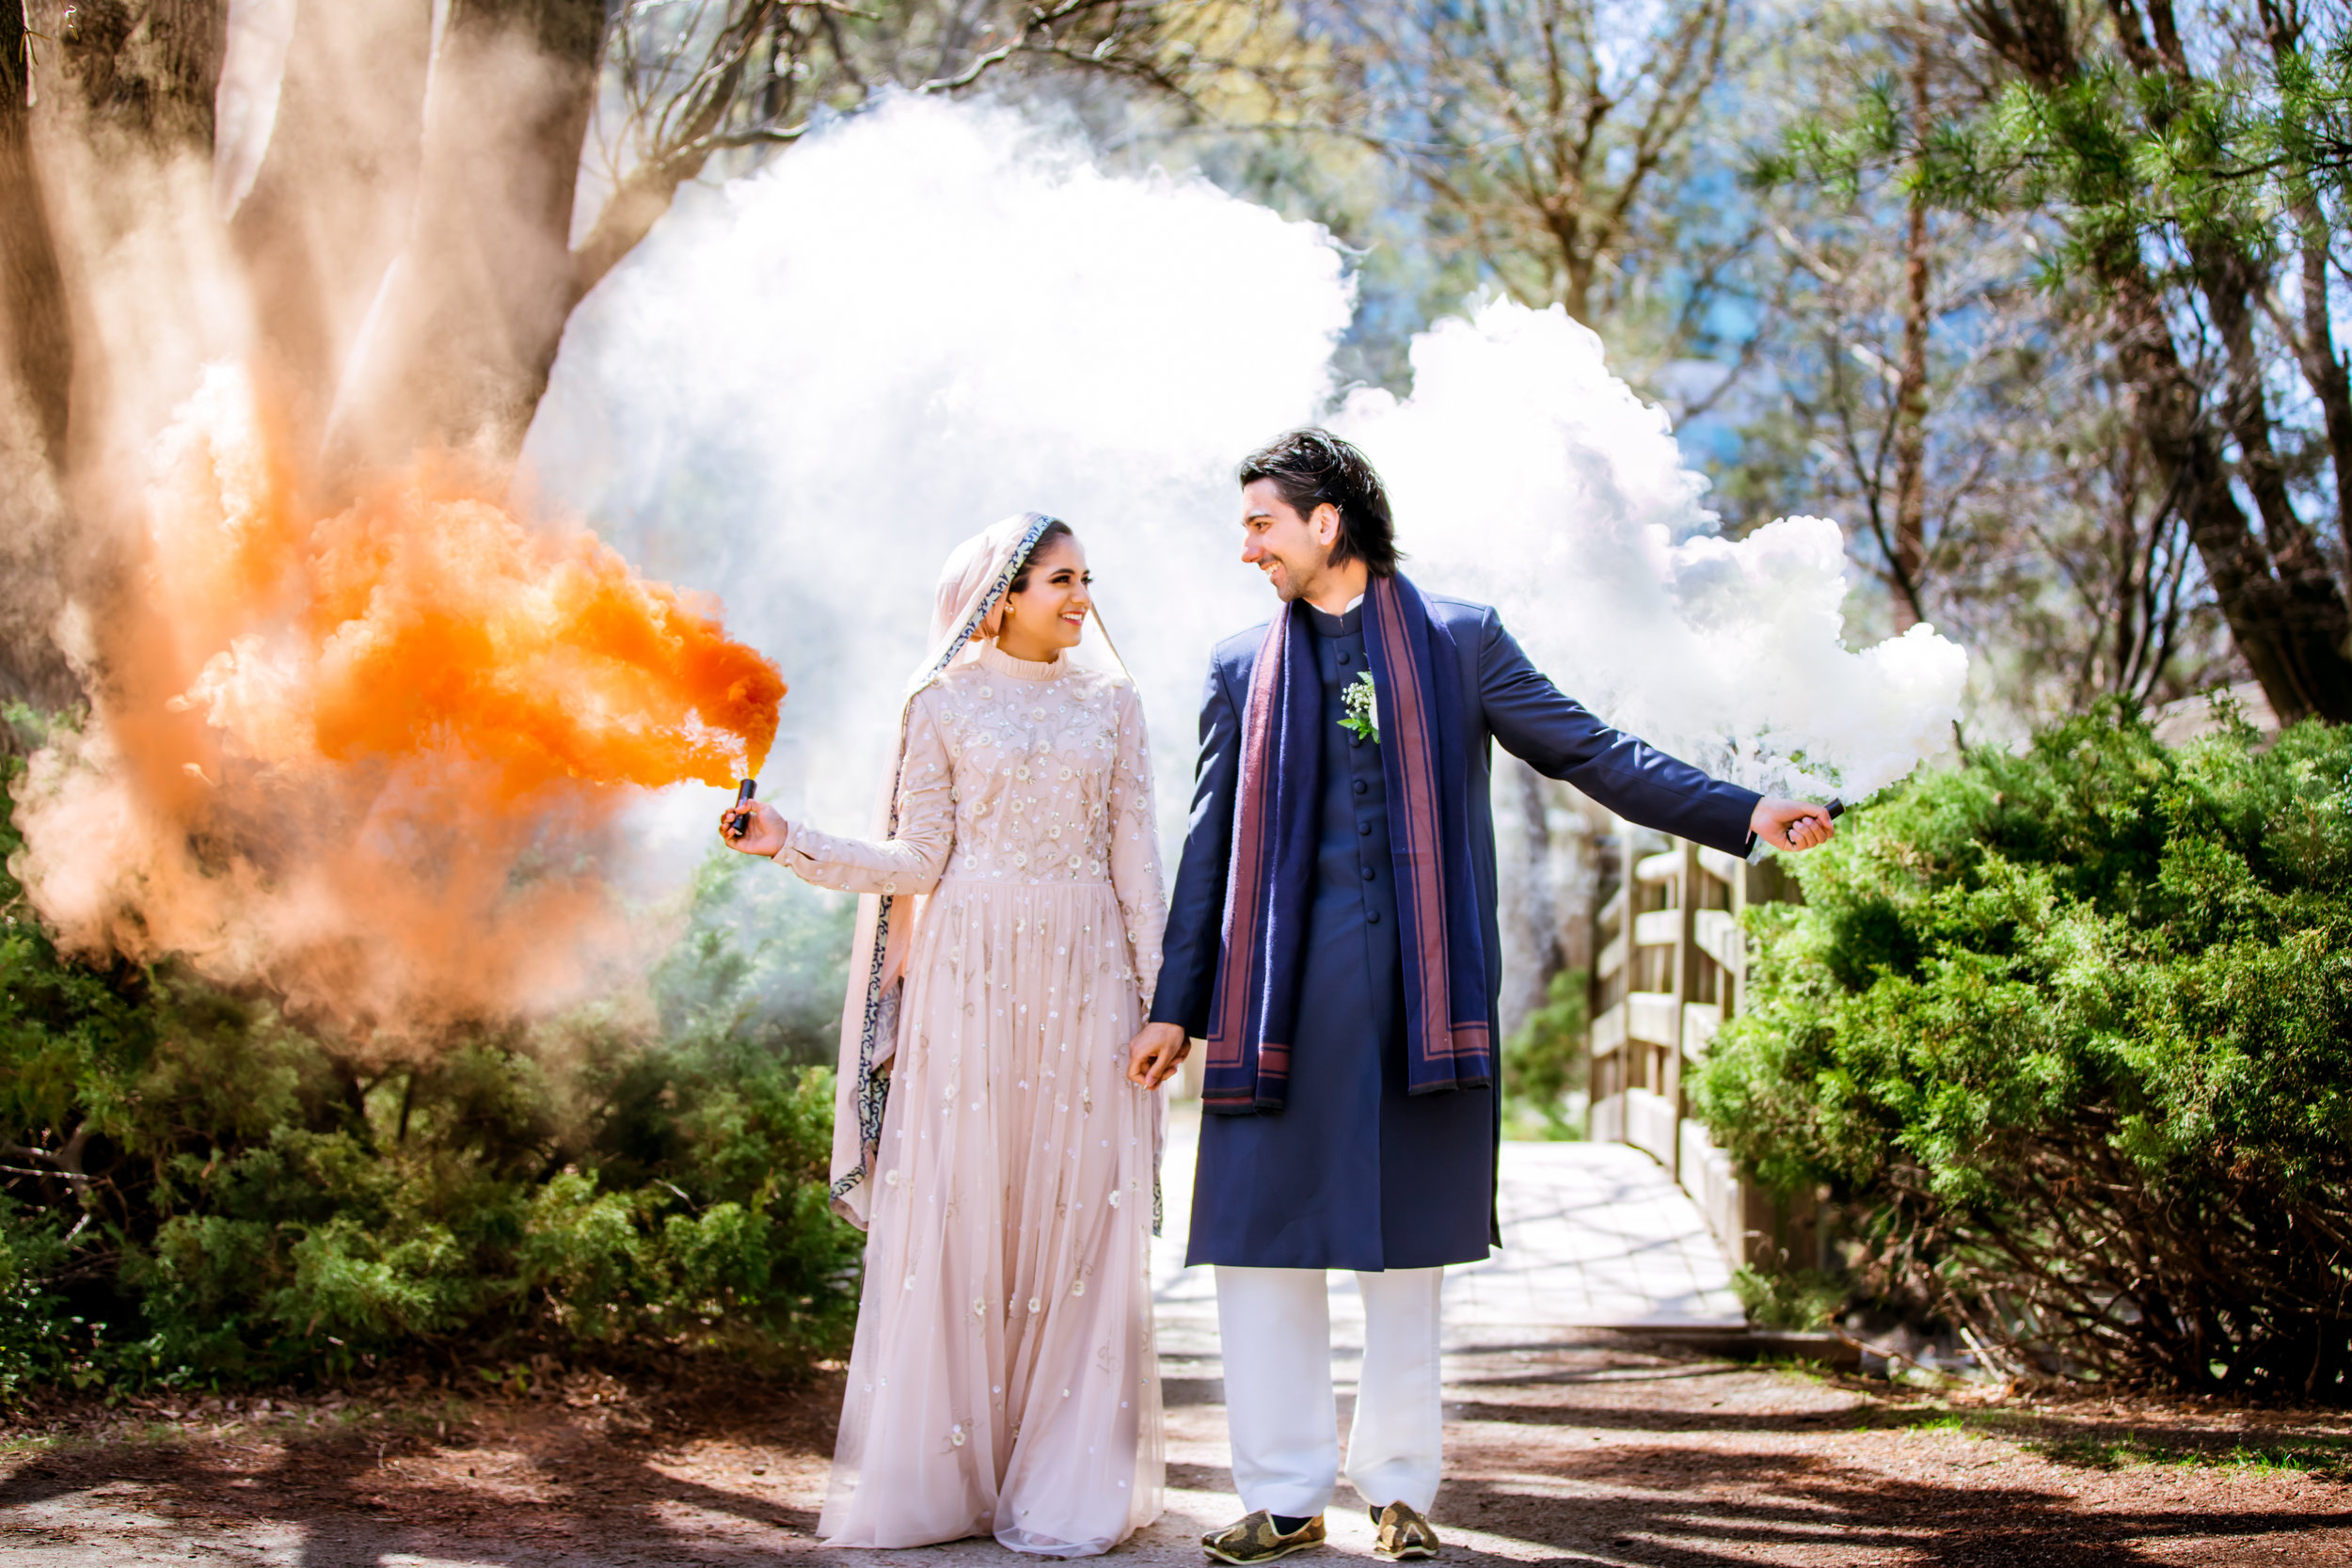 Karimah_Gheddai_Muslim_Sayeda_Khadija_Centre_Kariya_Park_GTA-Pakistani-Indian-Wedding-Engagement-Photographer-Photography_1.jpg